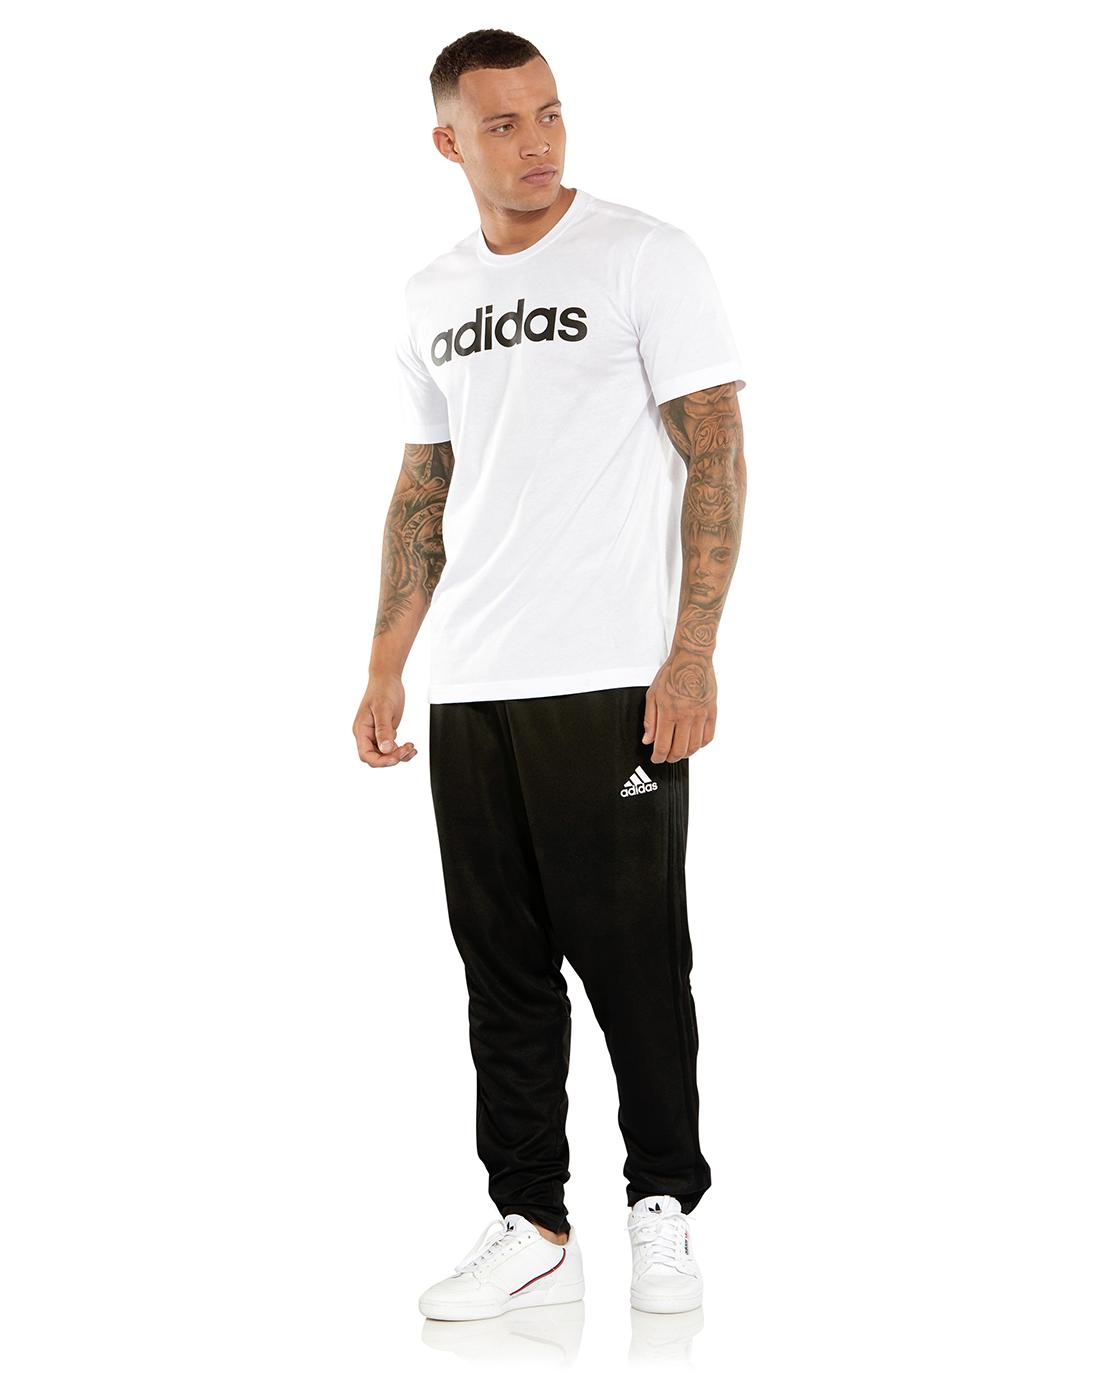 guys in adidas shorts